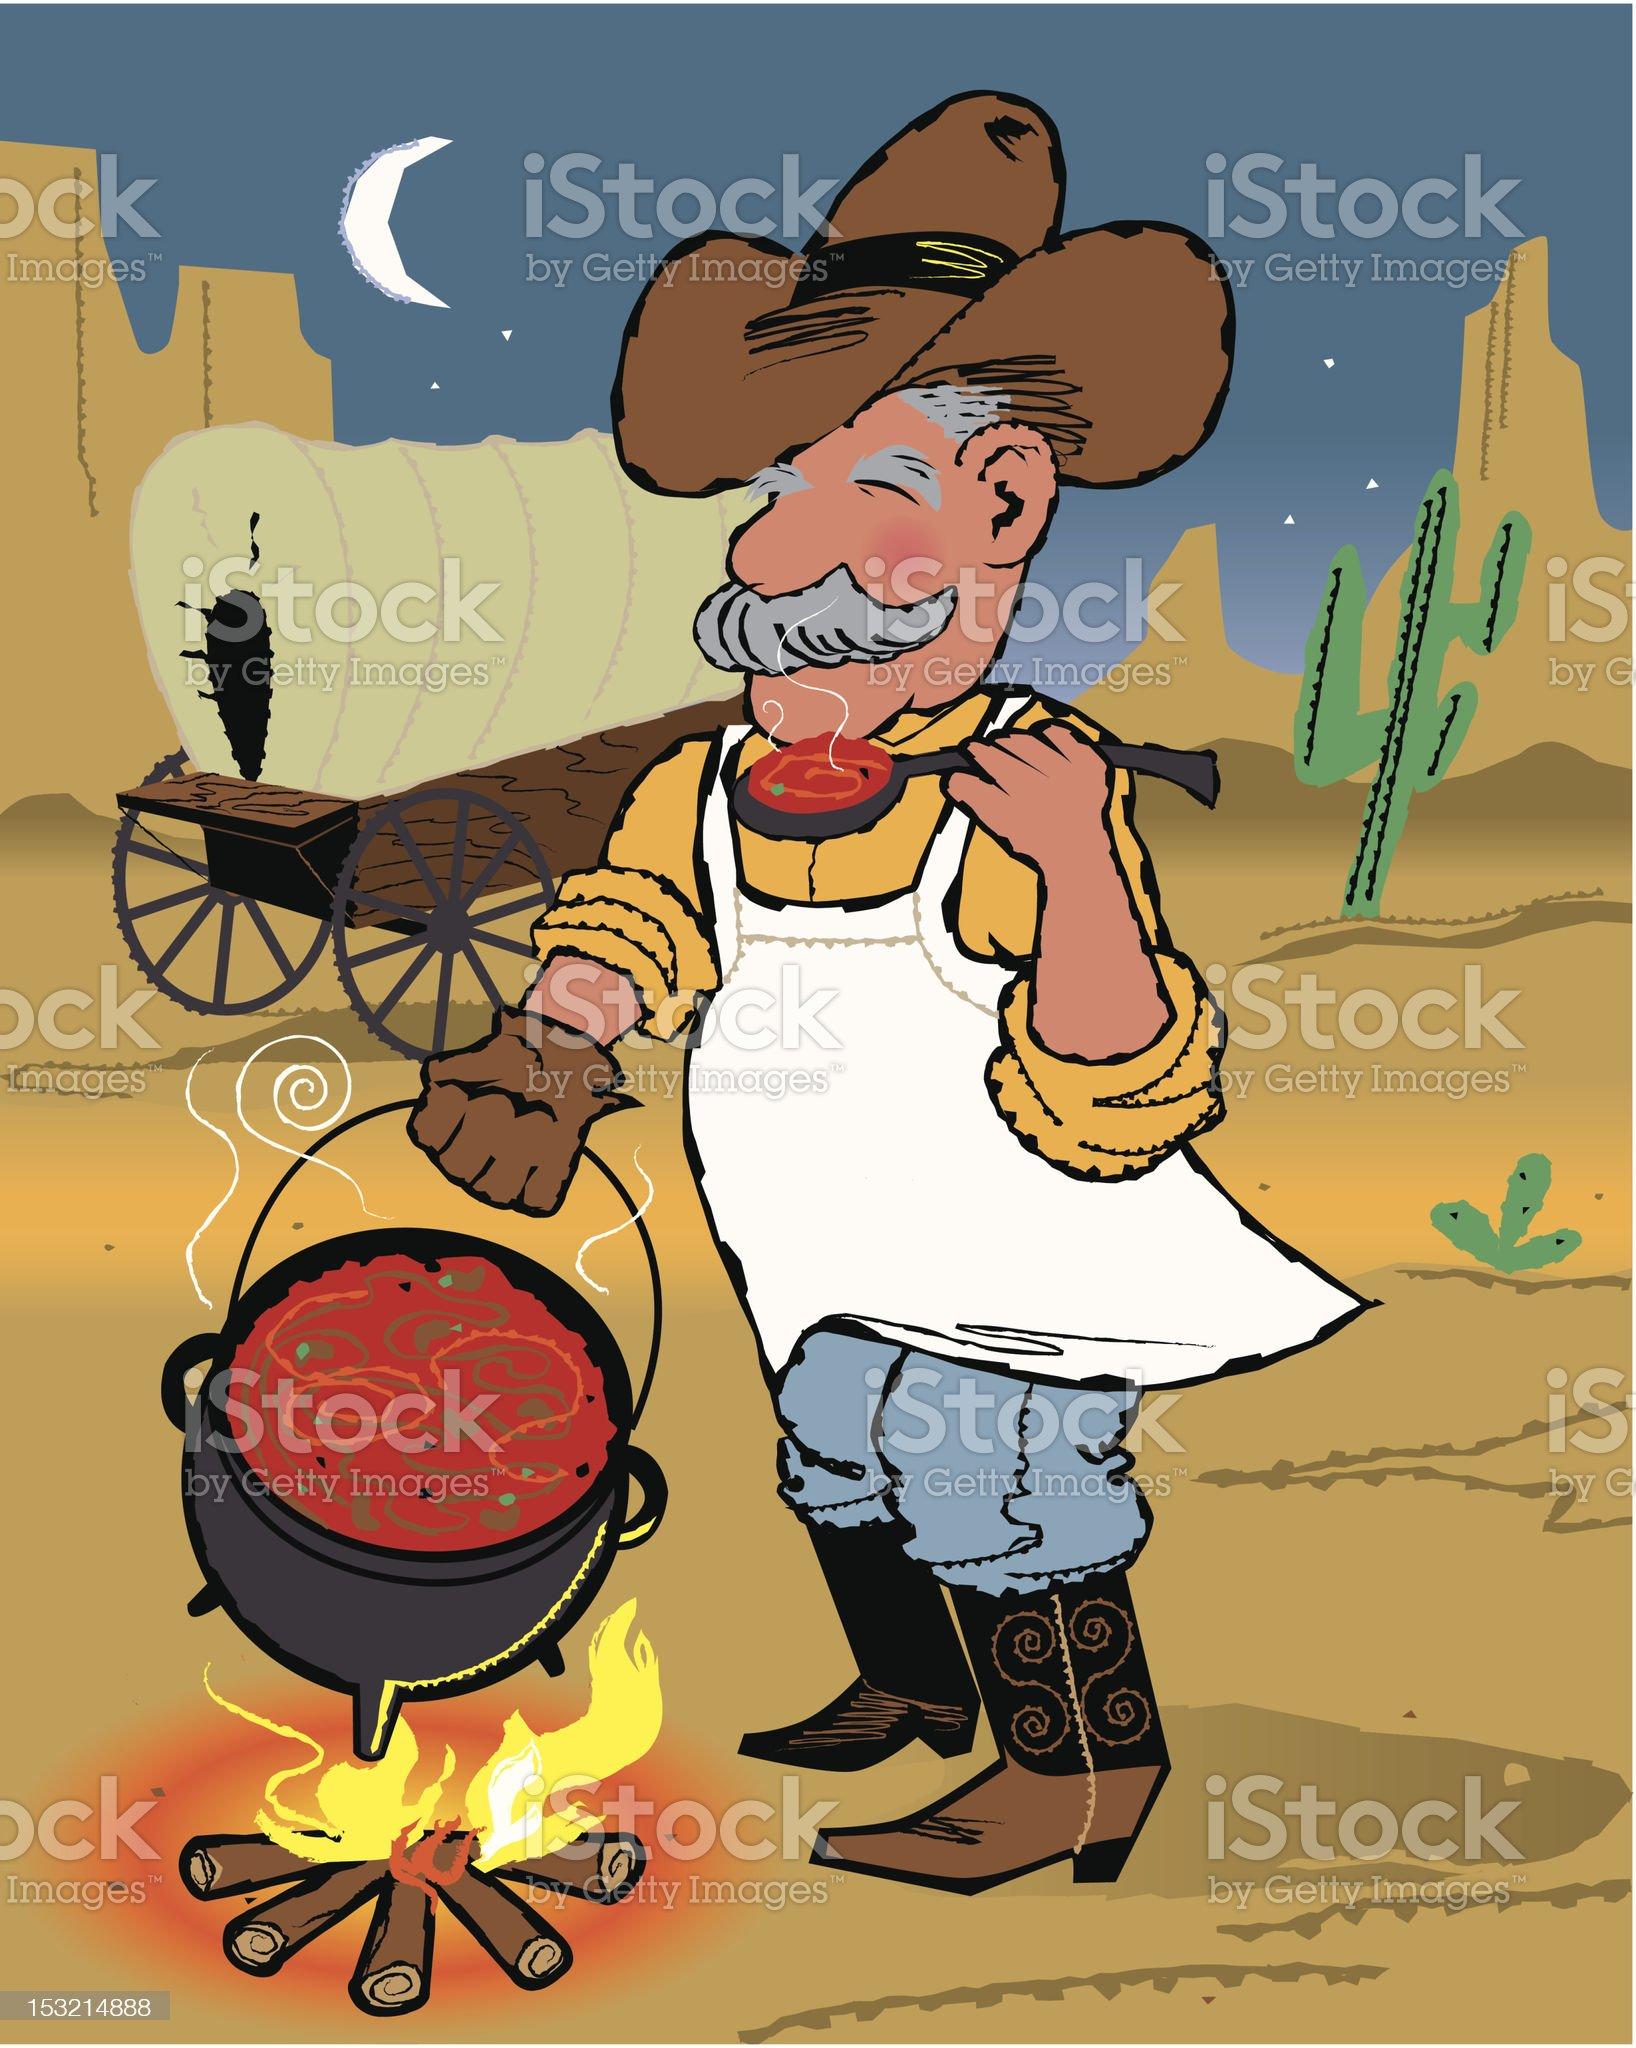 Cowboy Chef Making Chili Over Campfire Near Chuckwago royalty-free stock vector art